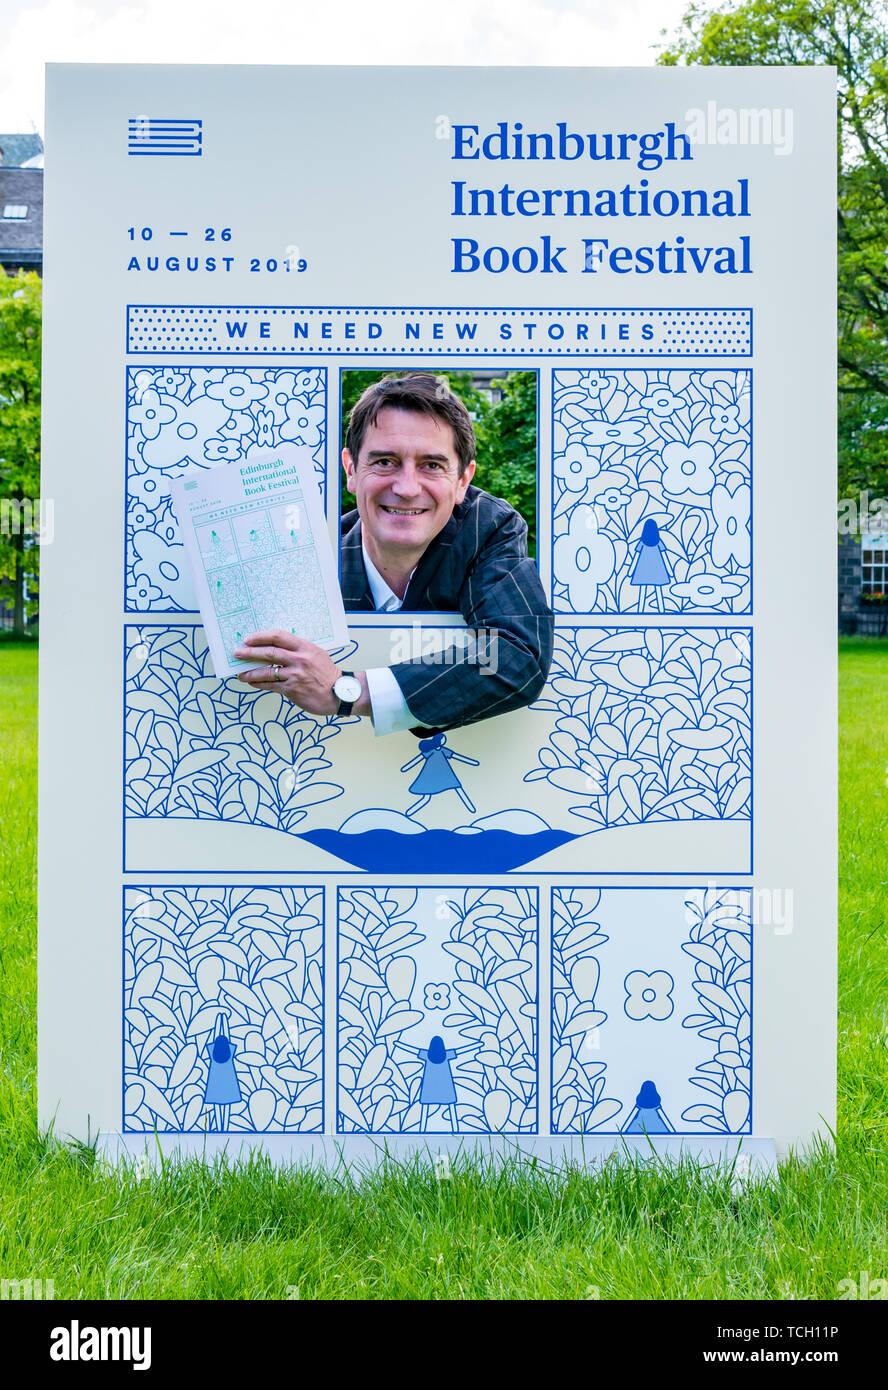 Nick Barley, Director Edinburgh International Book Festival launches the 2019  programme, Charlotte Square Gardens, Edinburgh, Scotland, UK - Stock Image